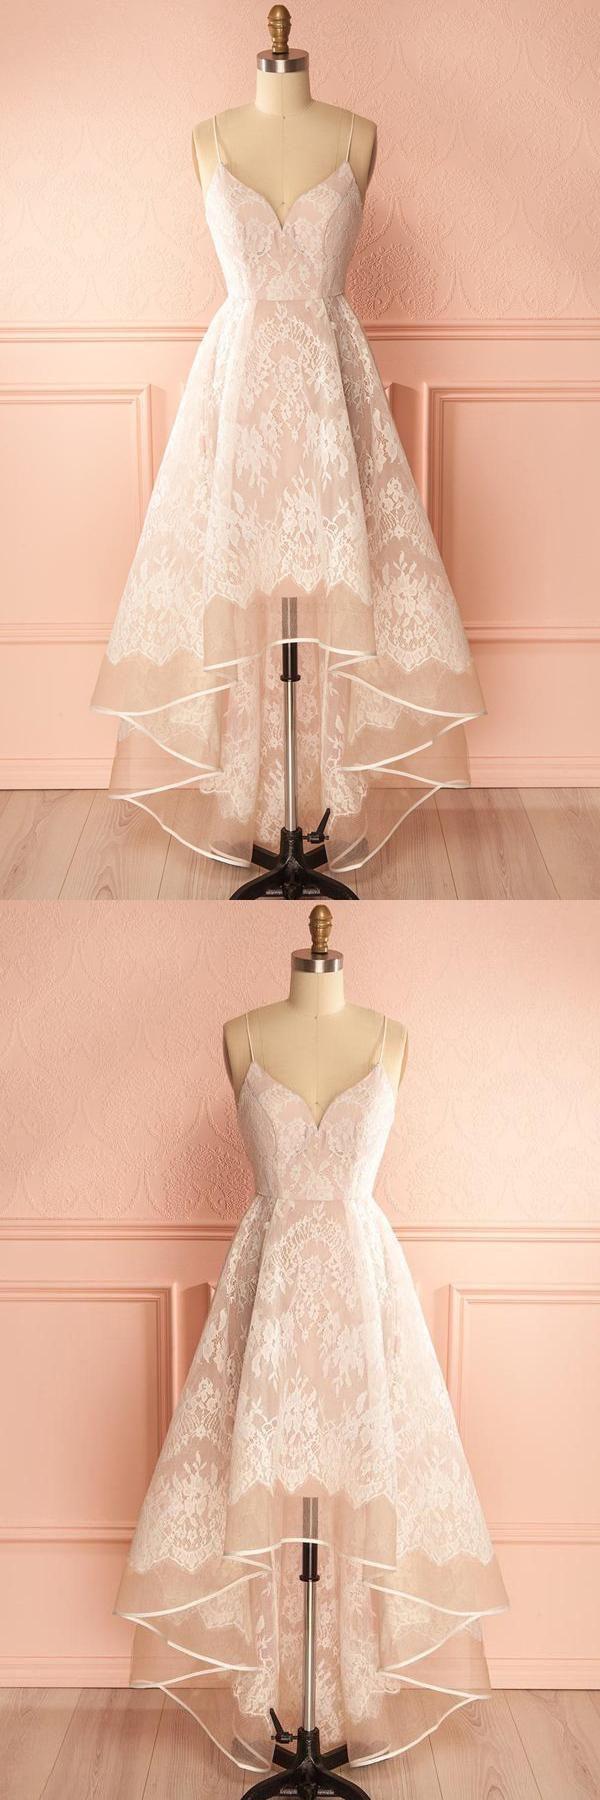 Prom dresses pink promdressespink open back homecoming dress